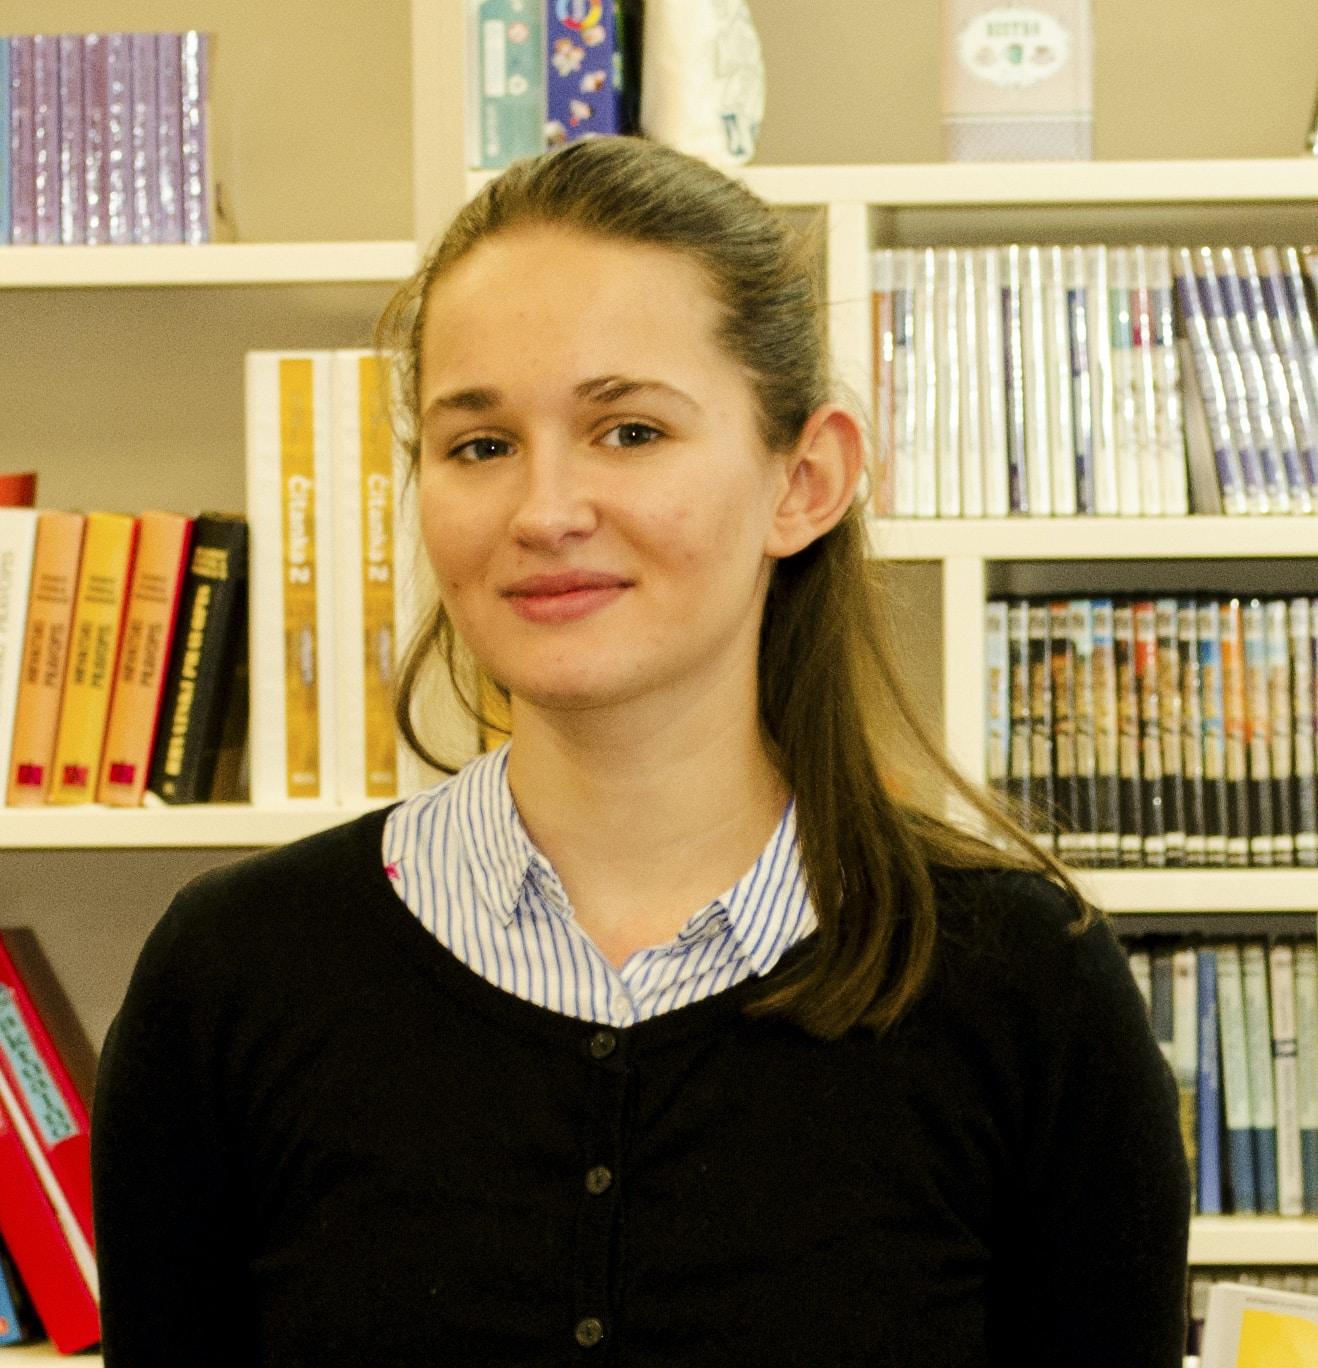 Go to Ivana Petrinjak's profile